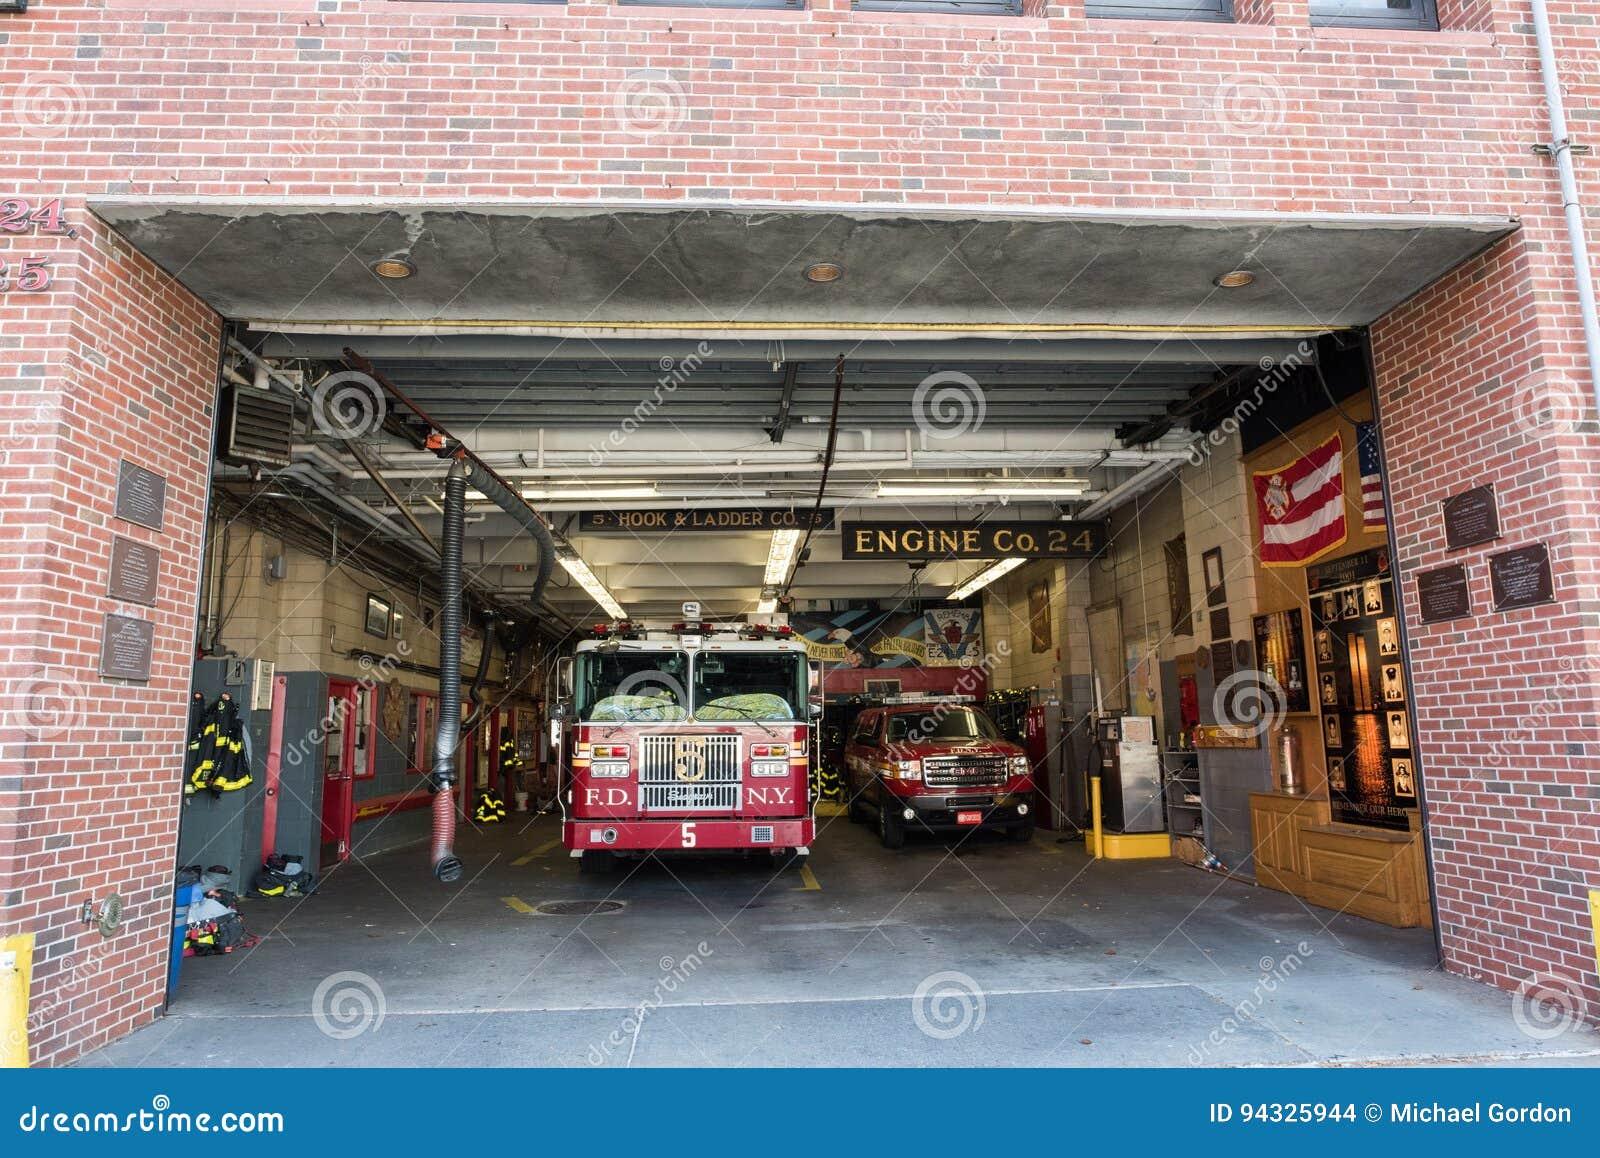 Fire Station in Manhattan, NYC